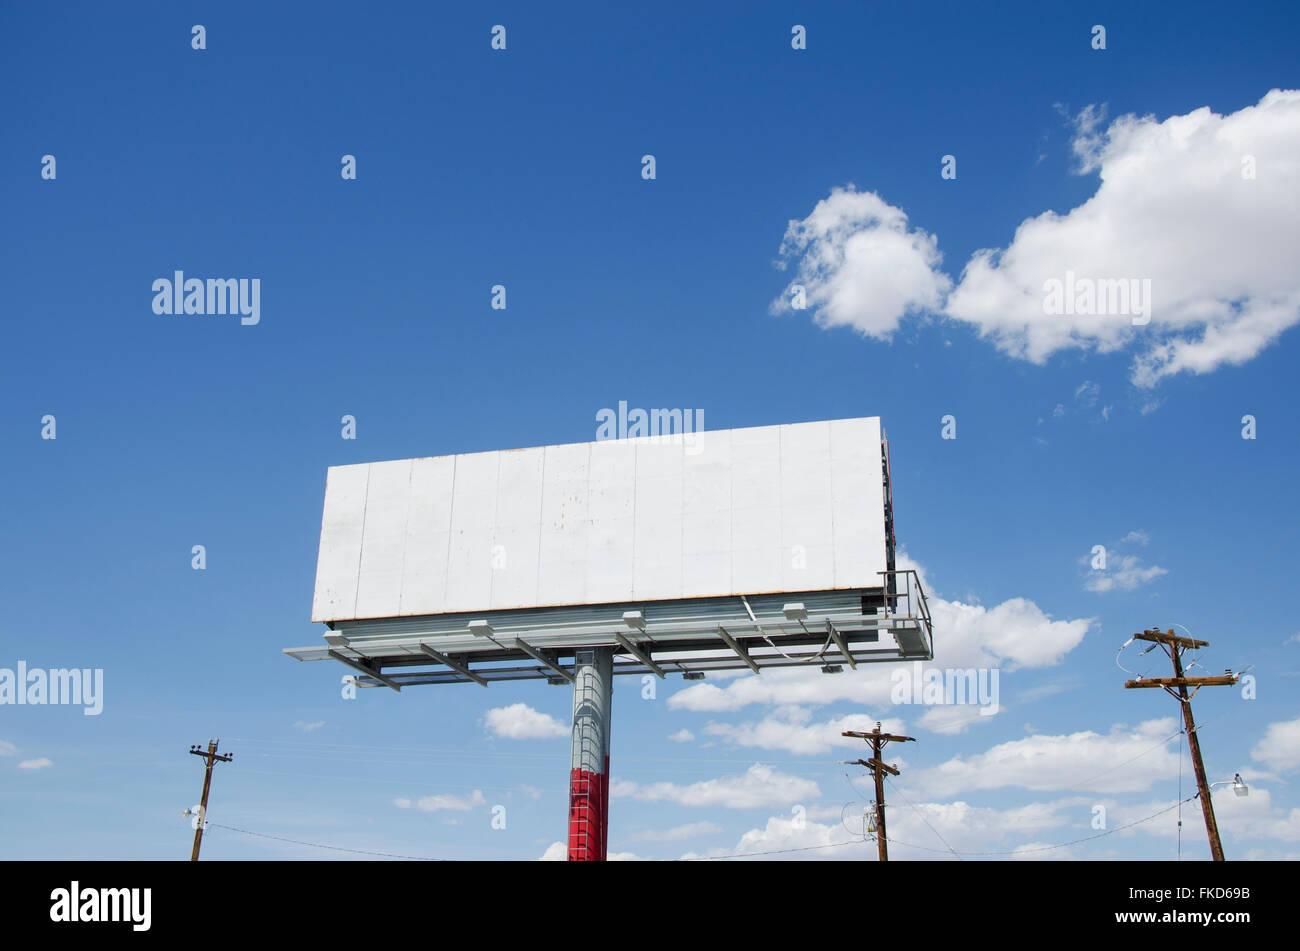 Empty billboard against sky - Stock Image